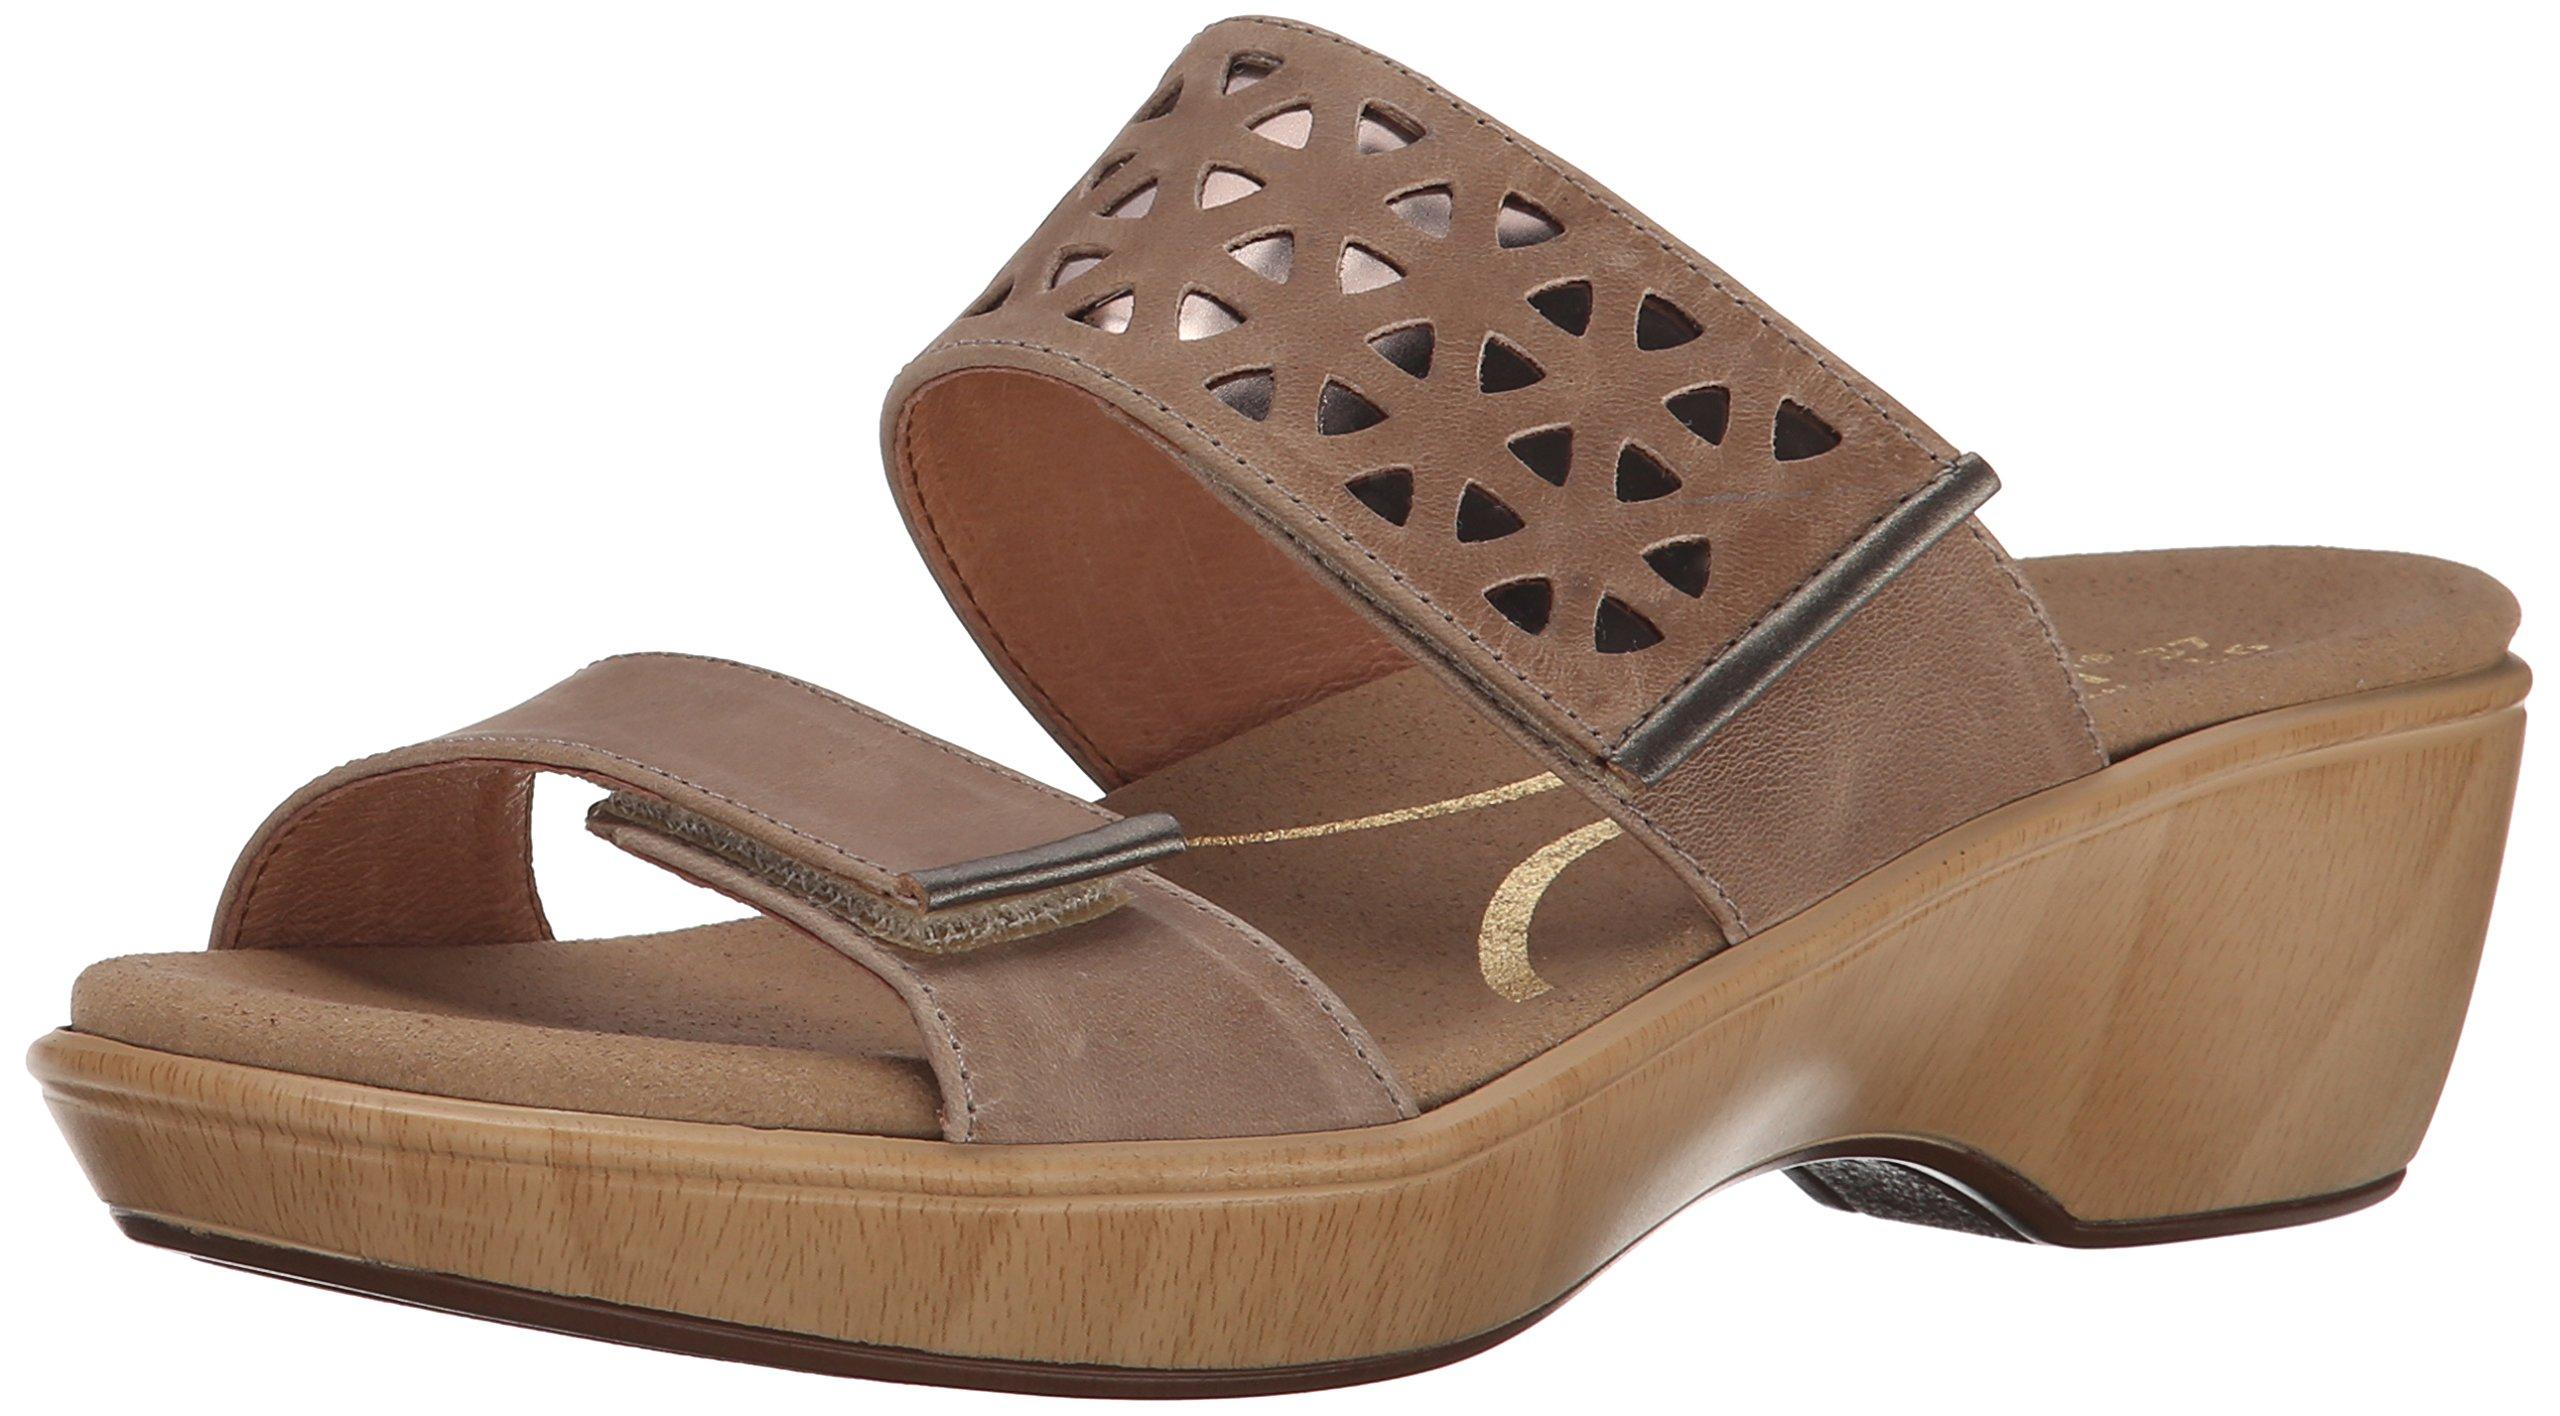 Naot Women's Moreto Wedge Sandal, Khaki Beige/Glass Silver/Pewter, 40 EU/8.5-9 M US